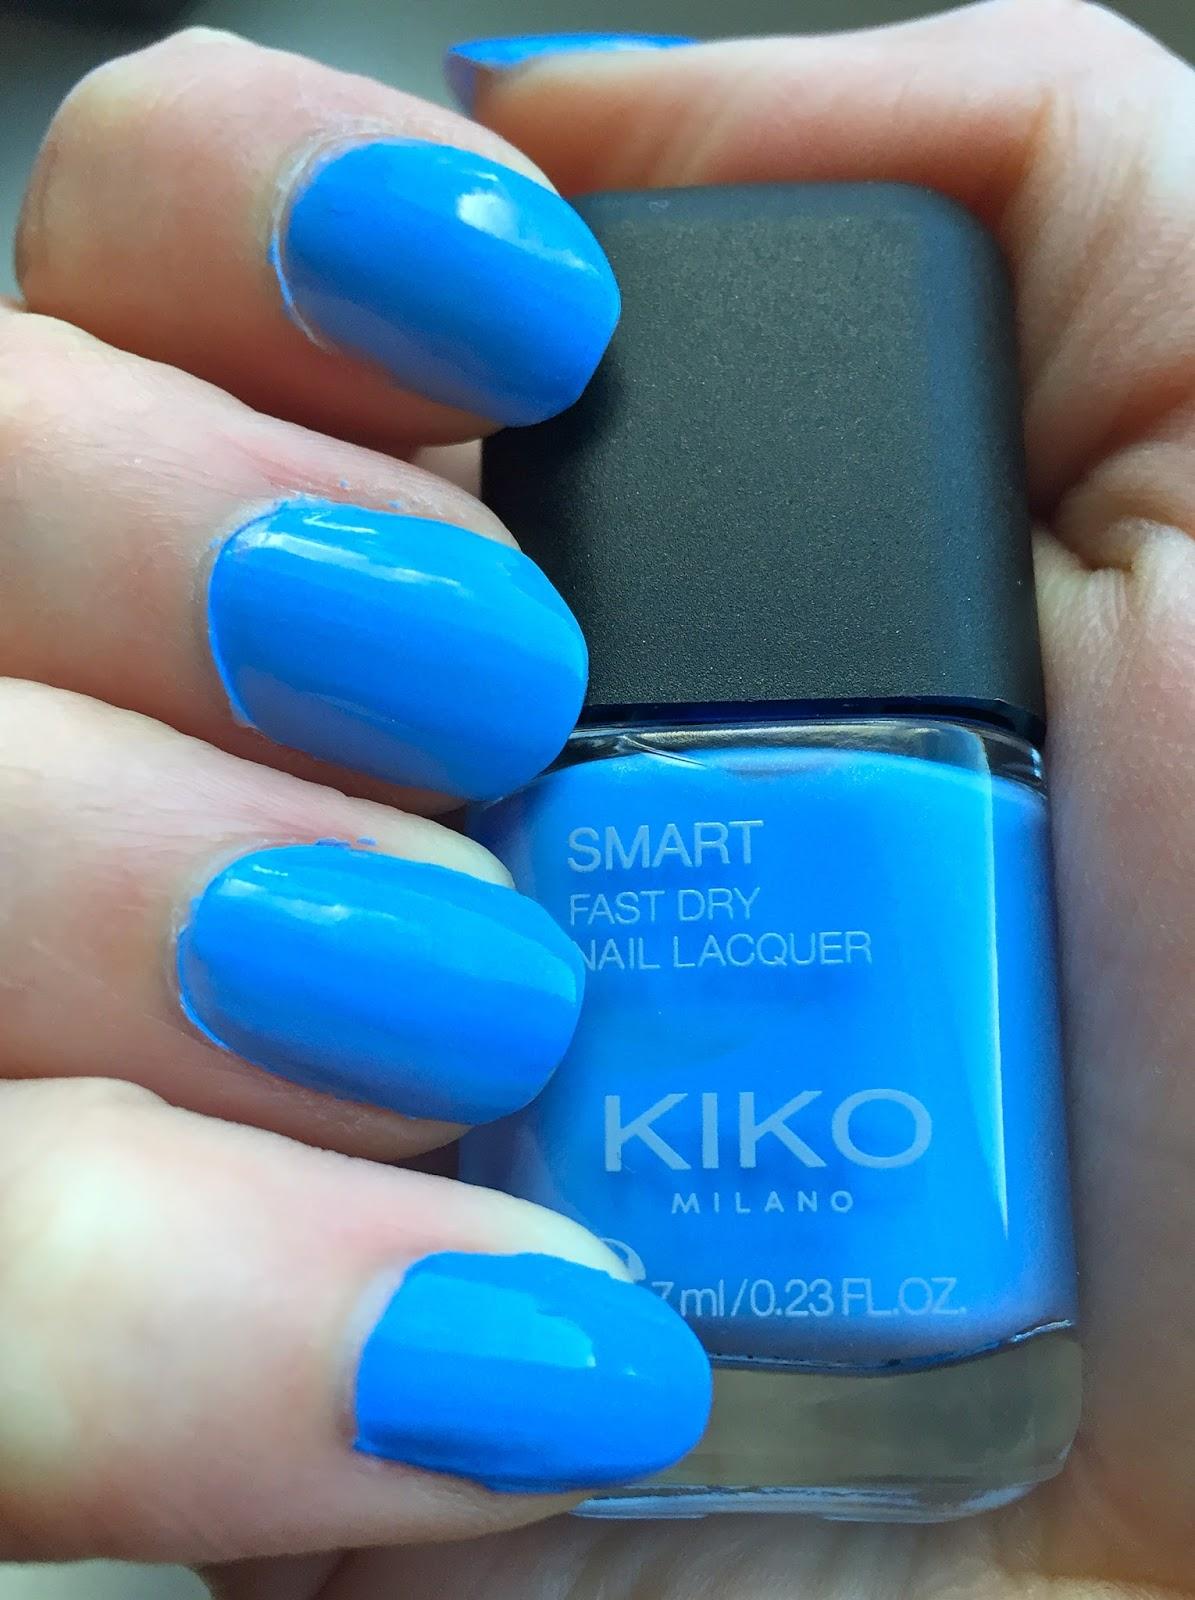 Smart Polish Nail Varnish - Creative Touch